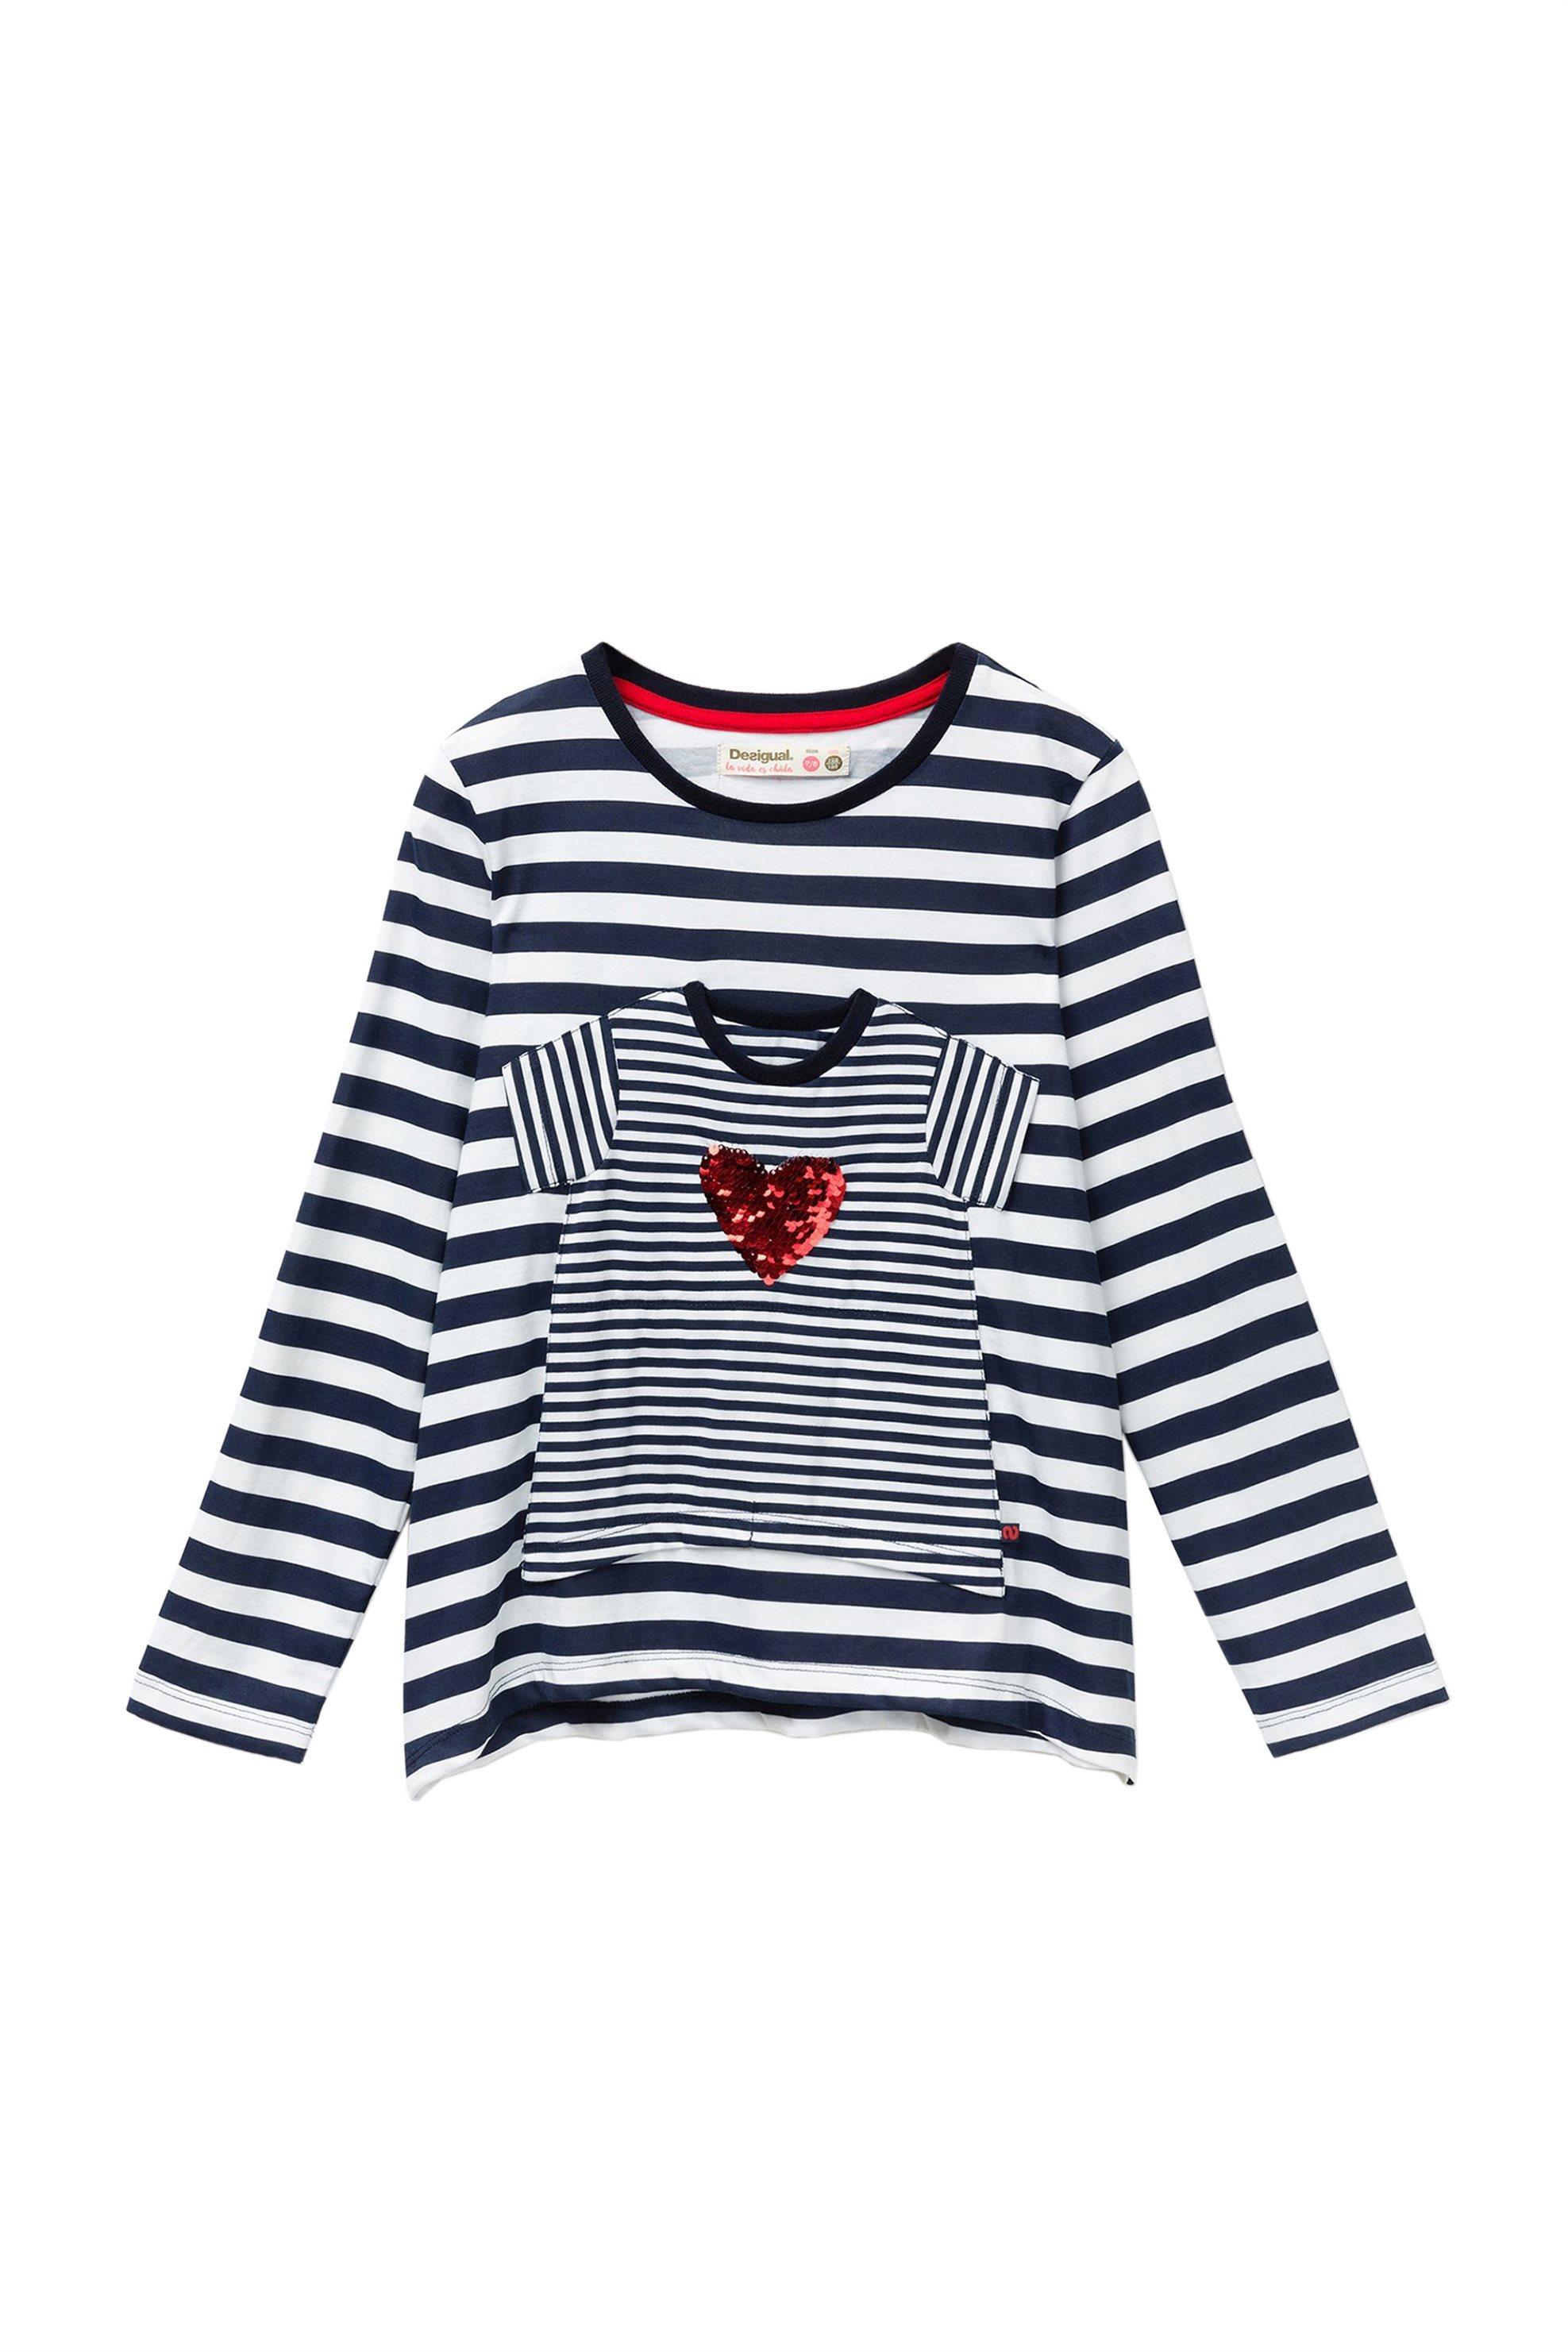 Desigual Παιδική Μπλούζα Sprinfiel - 18WGTK74 - Μπλε Σκούρο